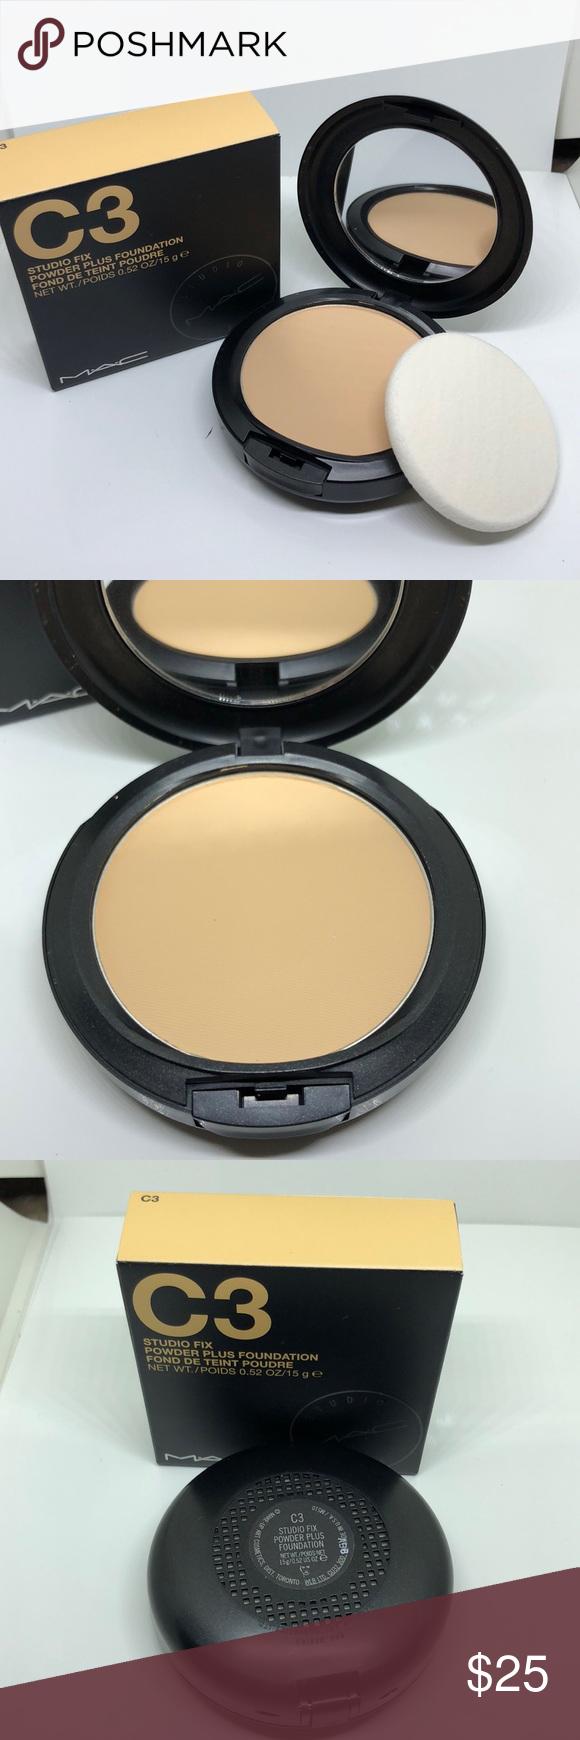 Mac studio fix powder plus foundation c3 New Mac studio